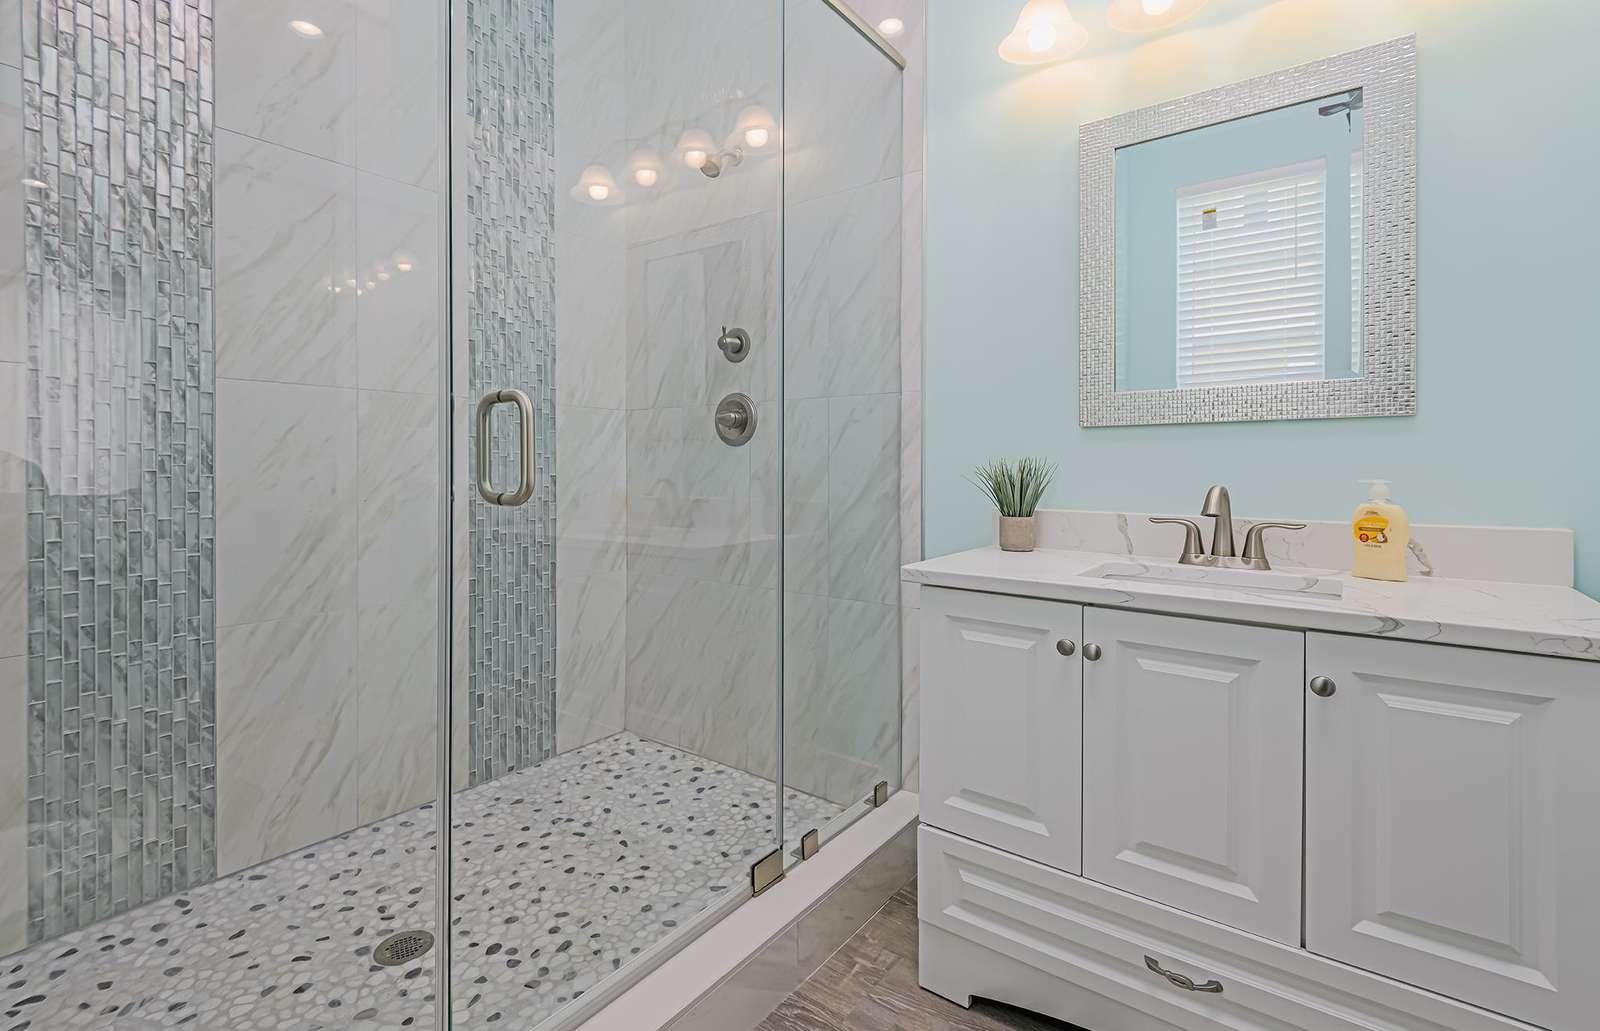 All baths are stocked with basic bath linen!